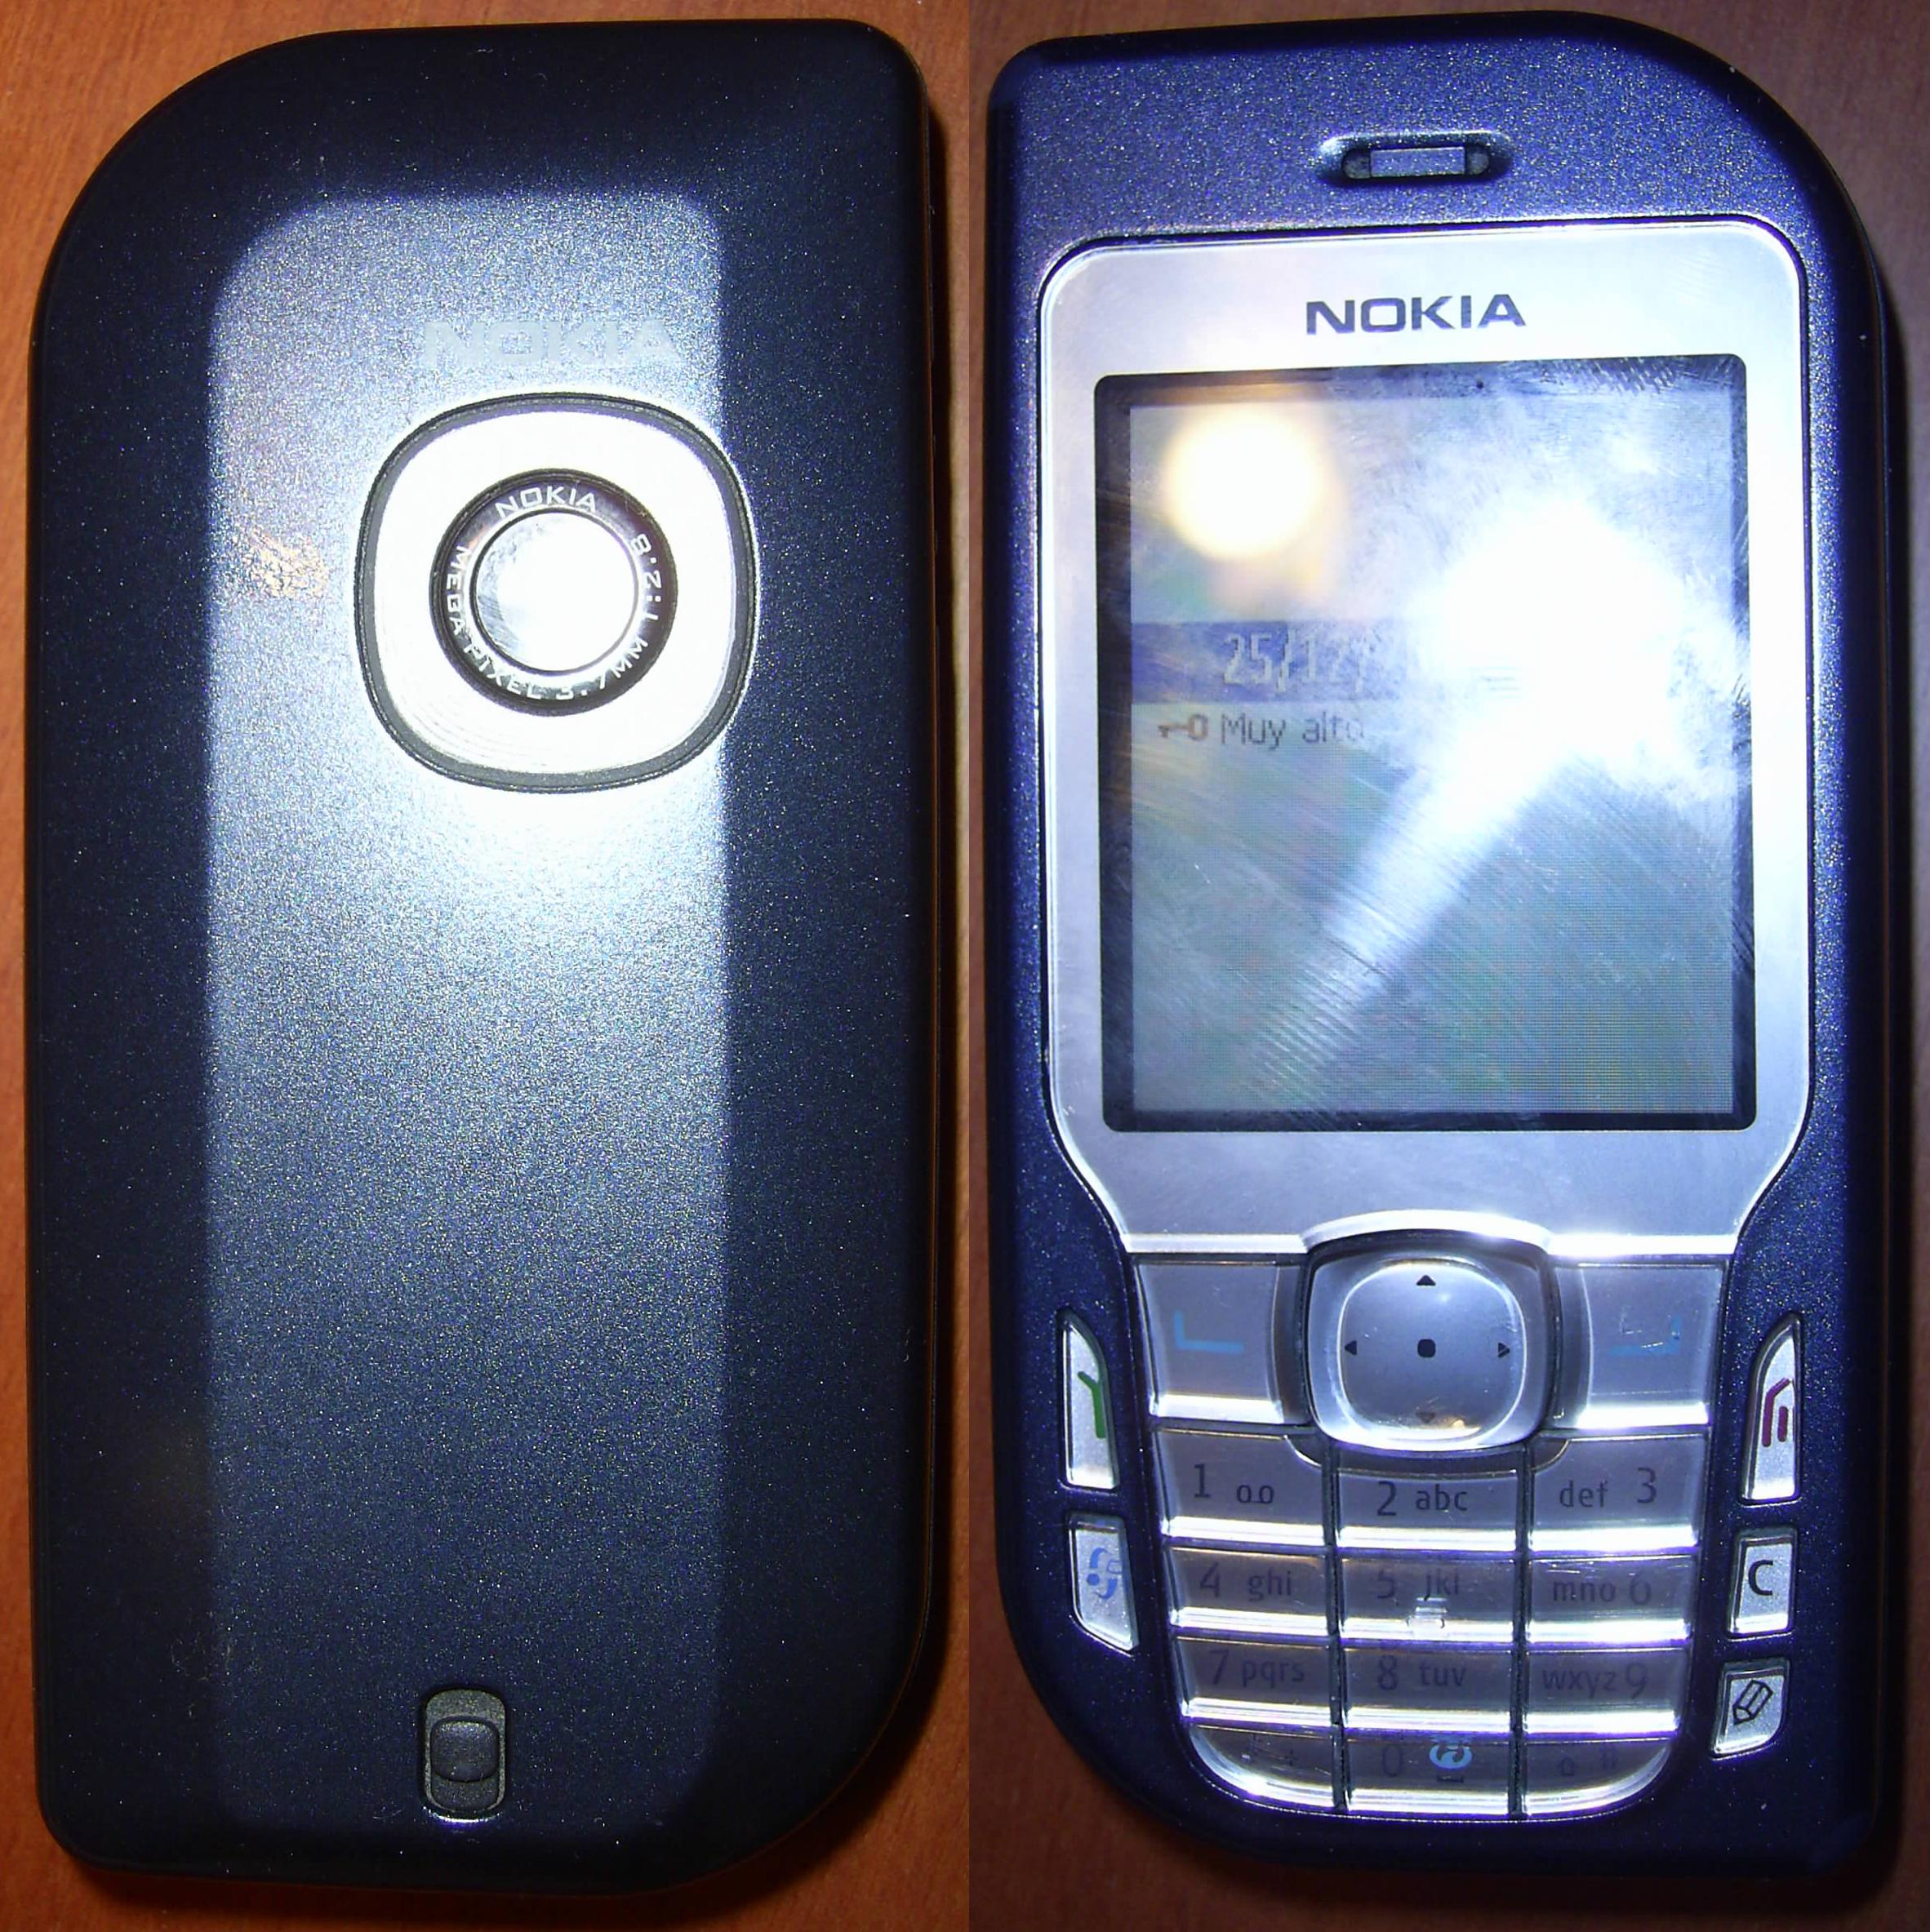 File:Nokia 6670.jpg - Wikipedia, the free encyclopedia